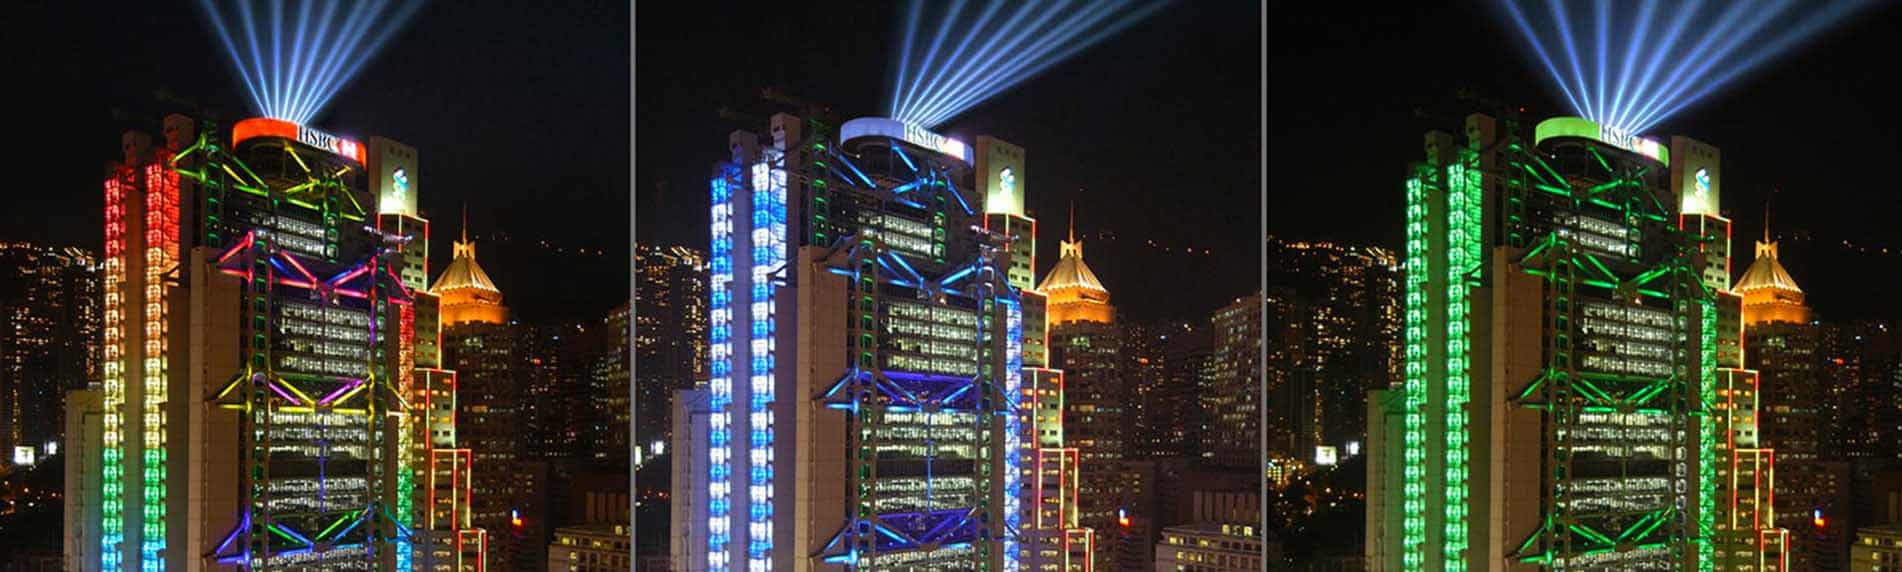 3 Nights Family Fun Hong Kong